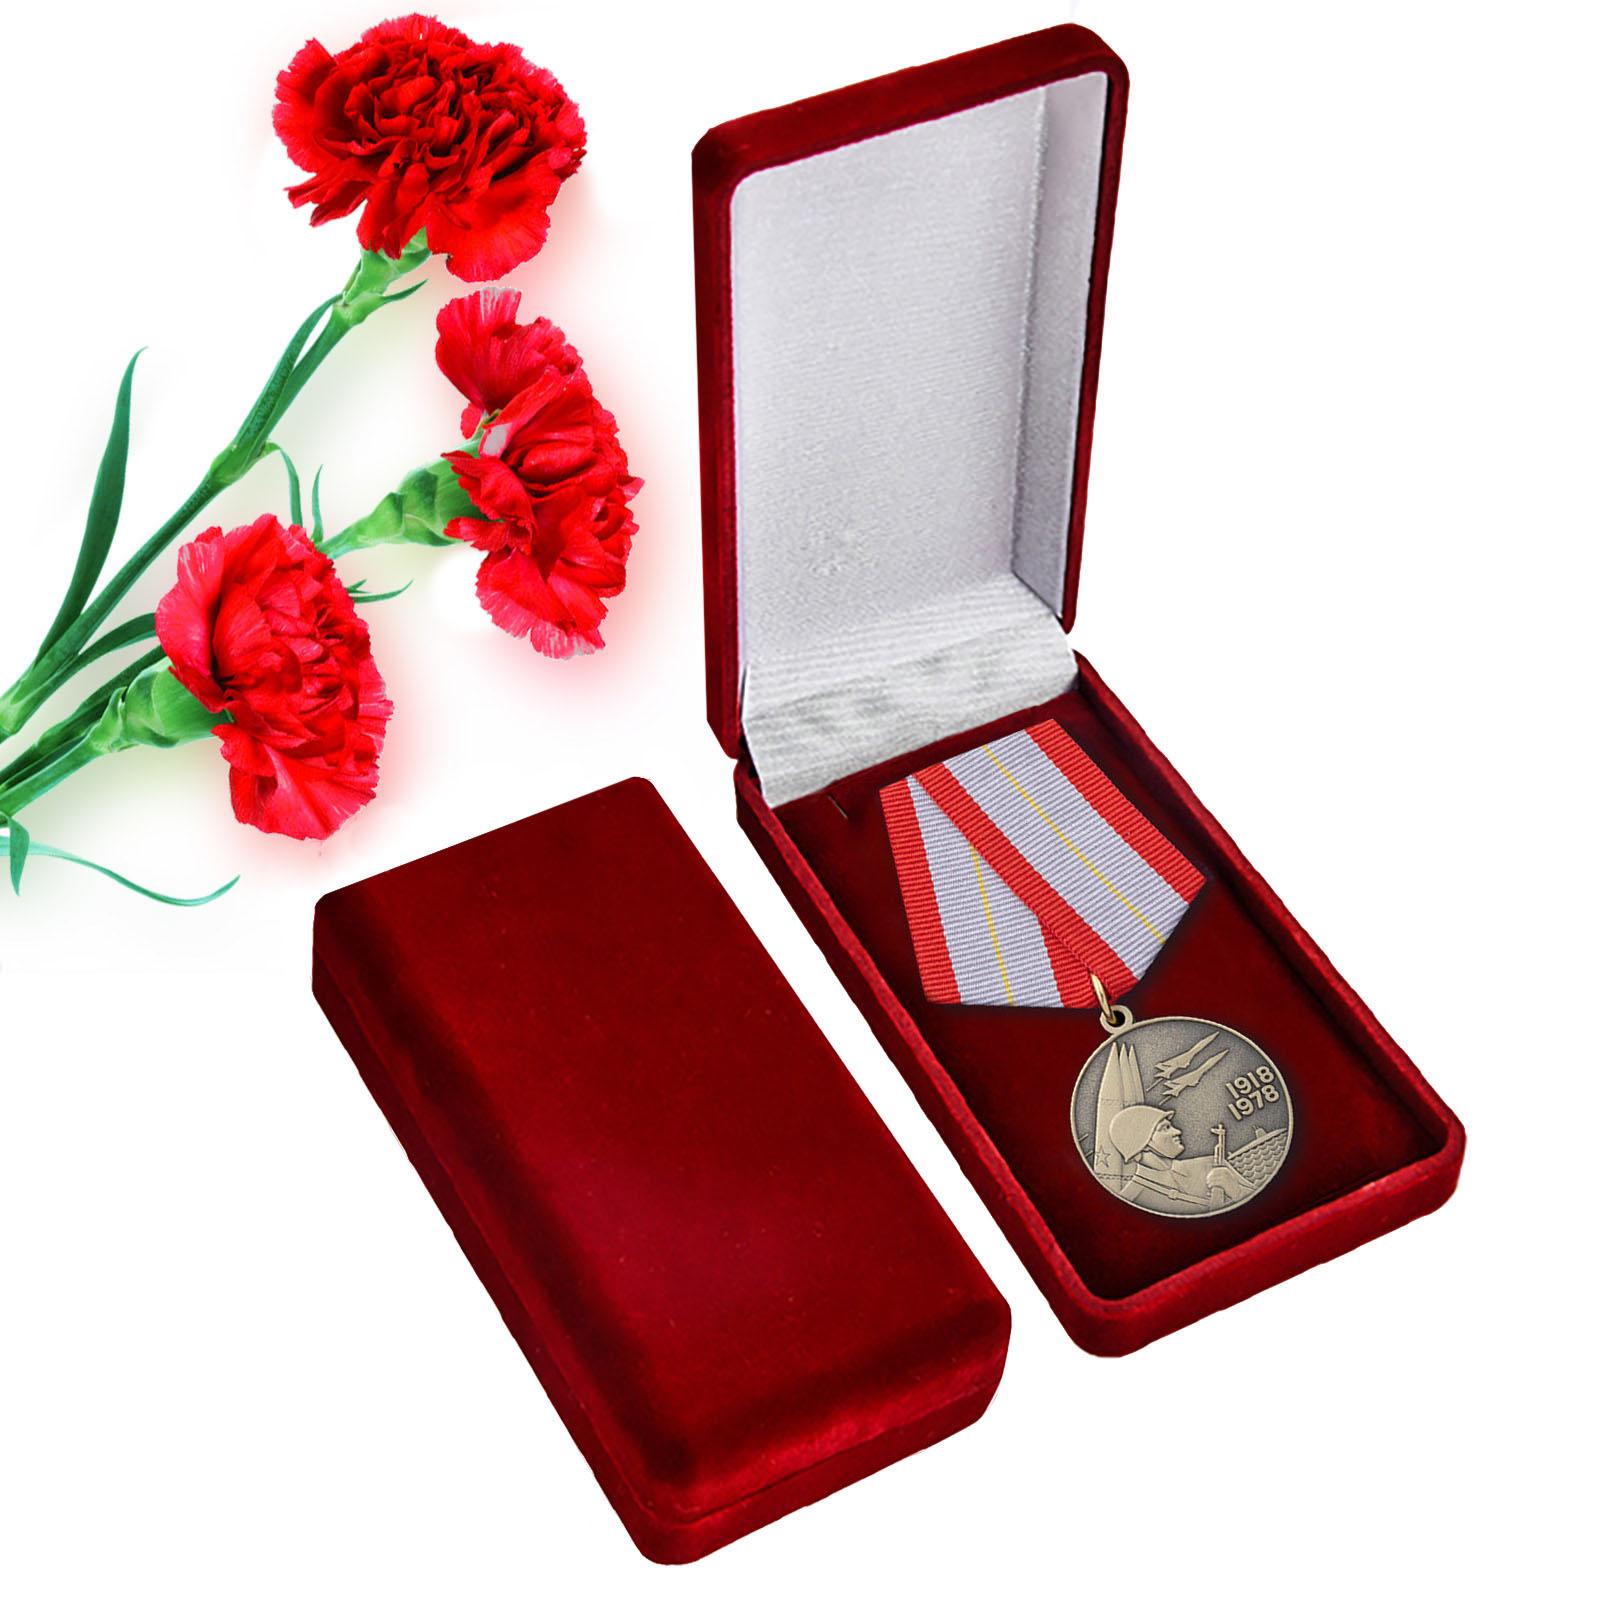 Медаль 60 лет Вооружённых Сил